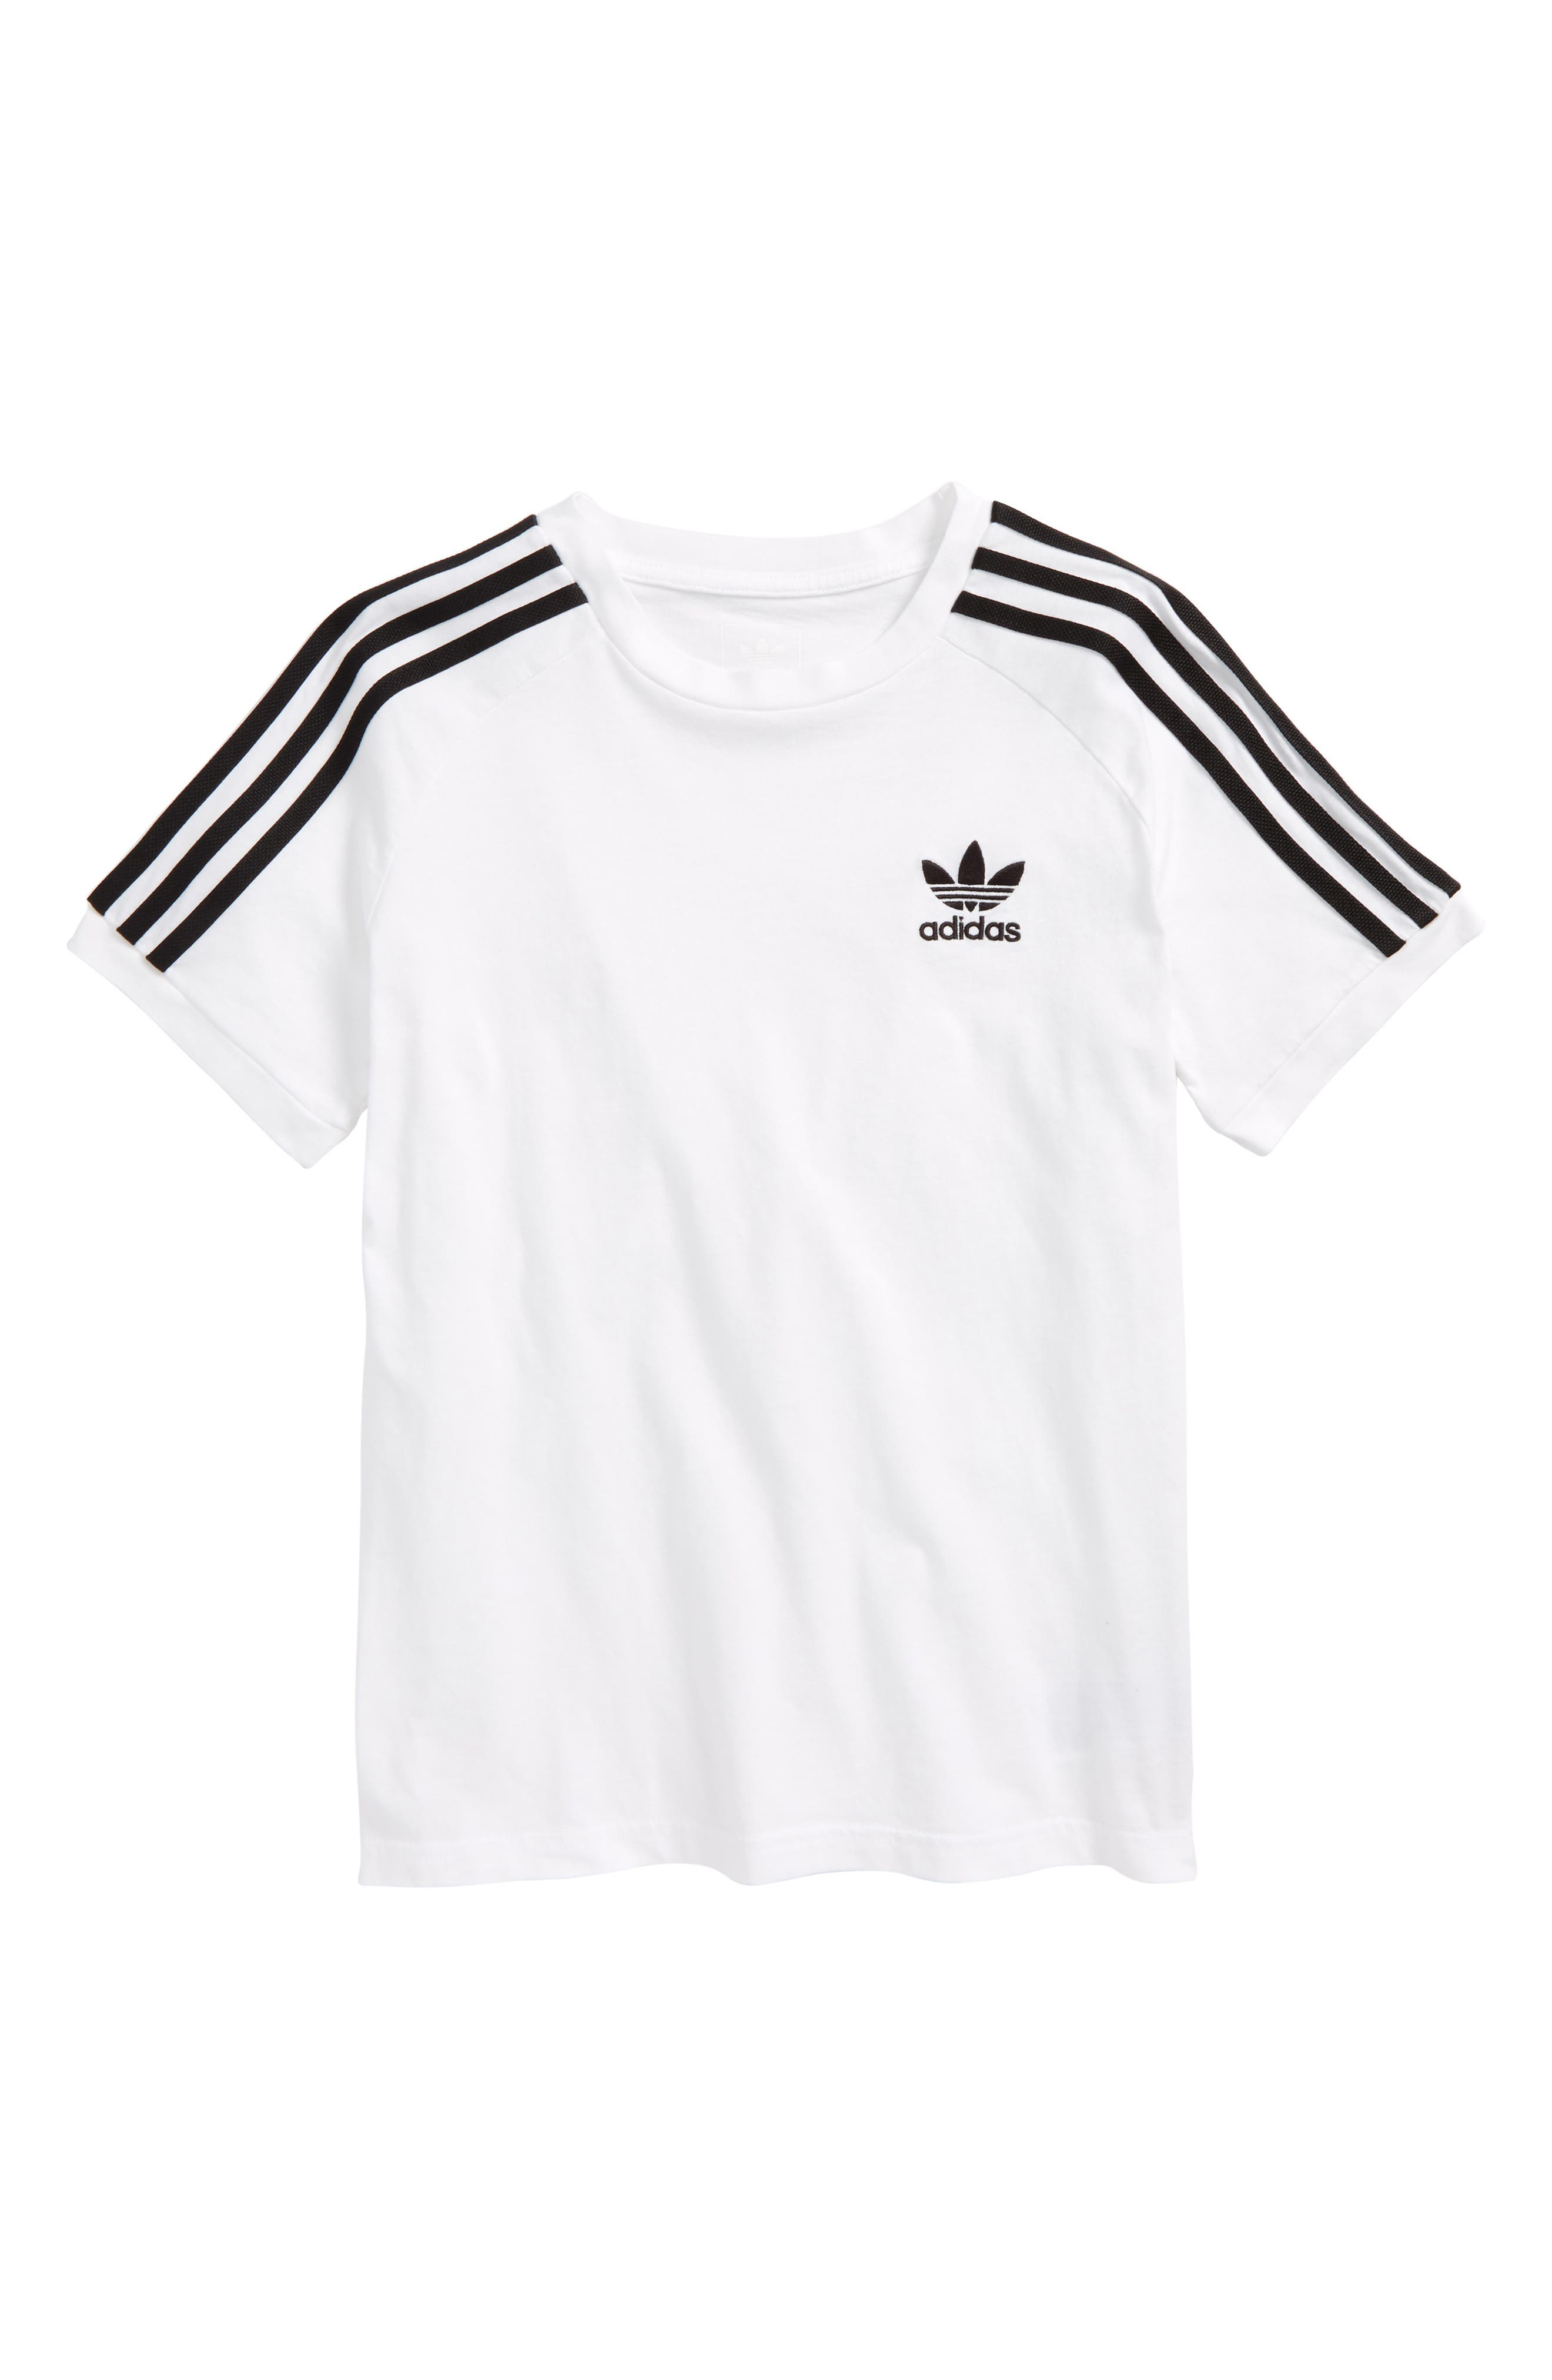 California T-Shirt,                         Main,                         color, WHITE/ BLACK